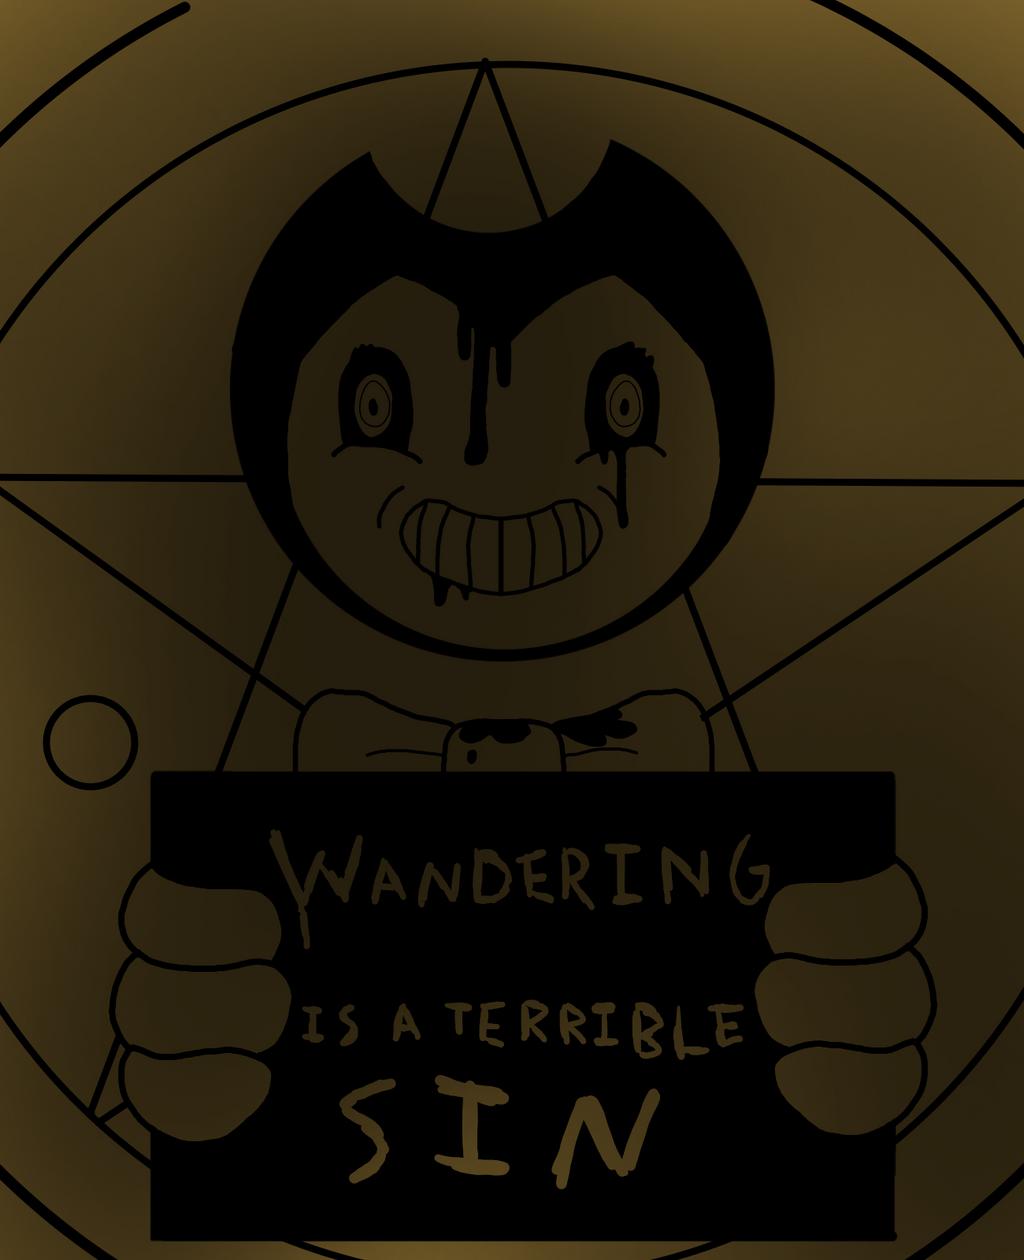 Wandering is a terrible sin by RichardtheDarkBoy29